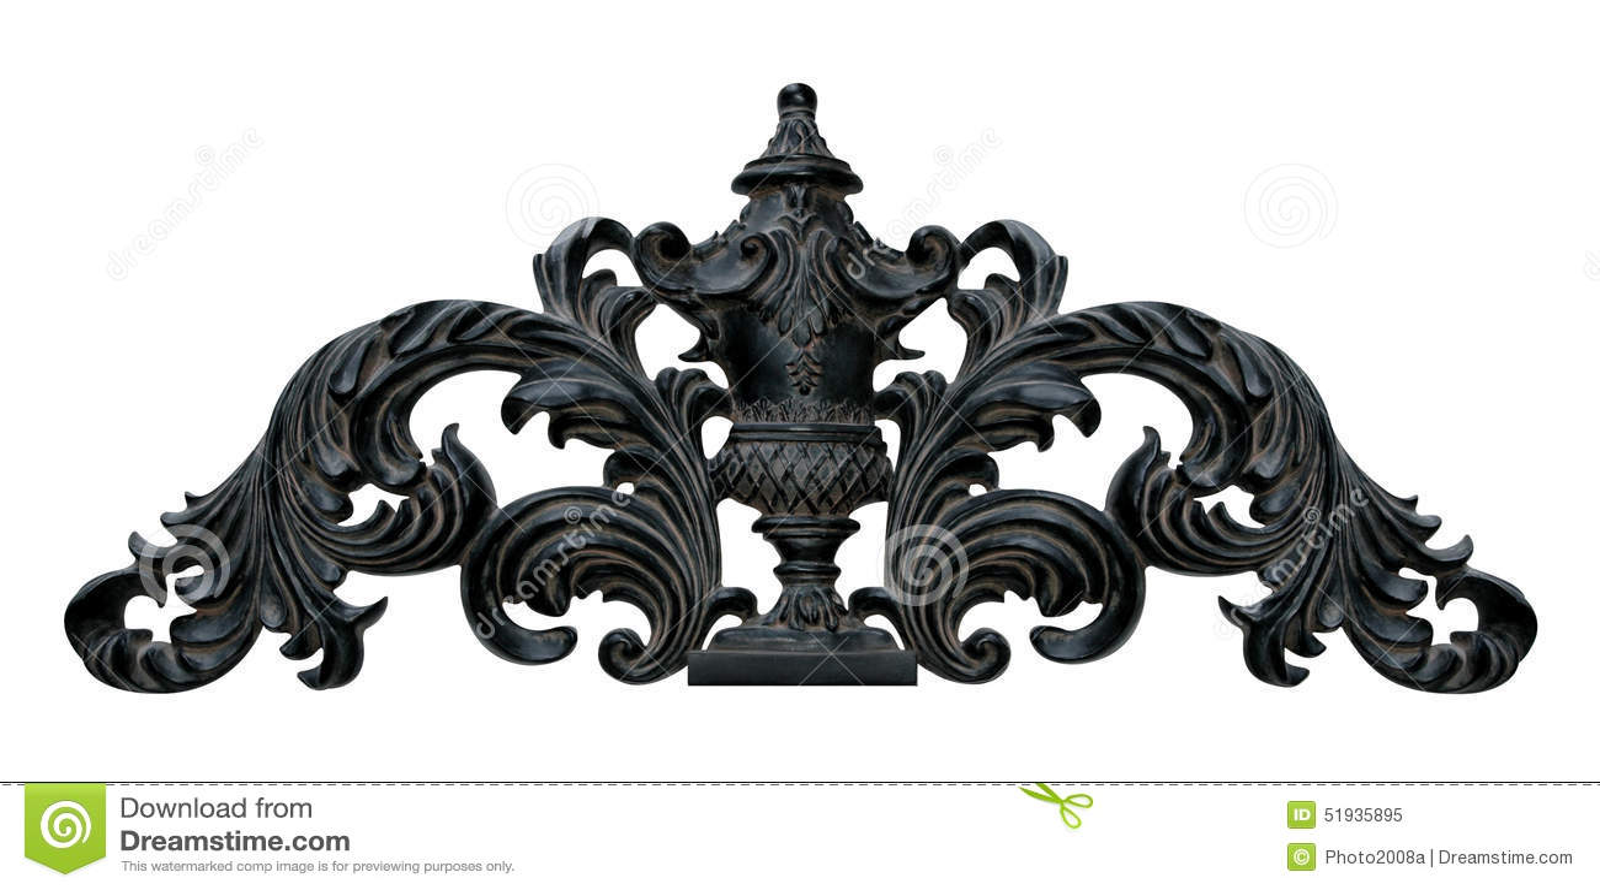 Dekorative Wand Kronen Dekoration Stockbild Bild Von Dekor Wand 51935895